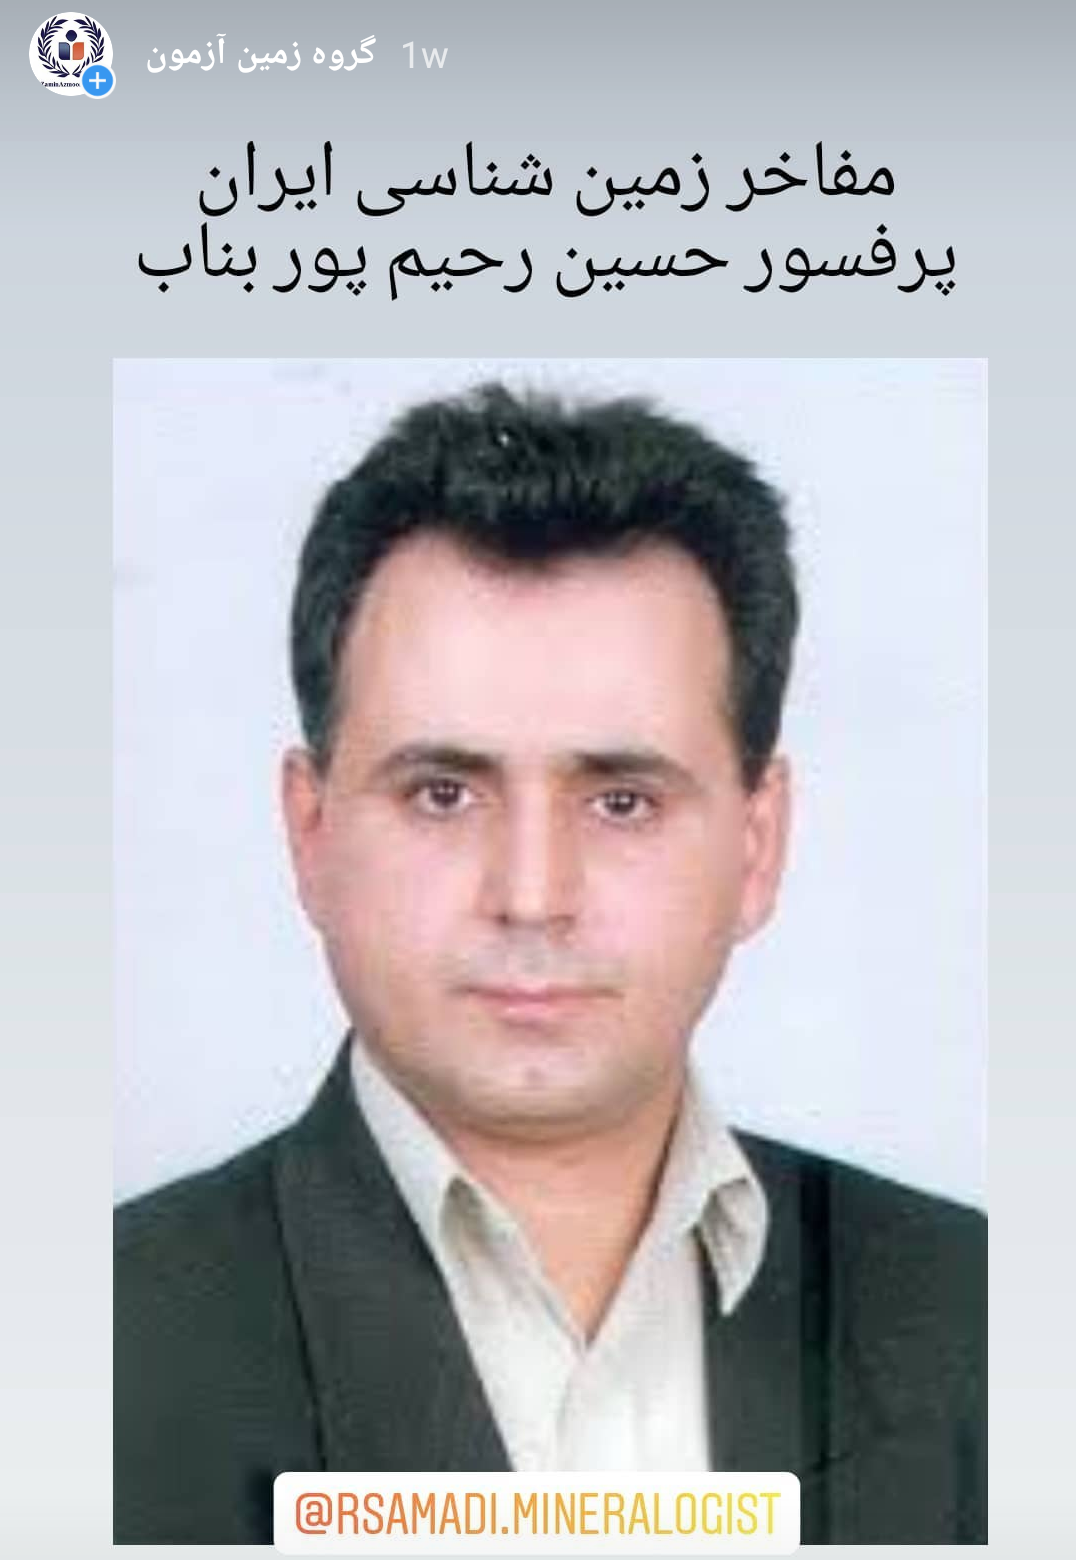 دکتر حسین رحیم پور بناب